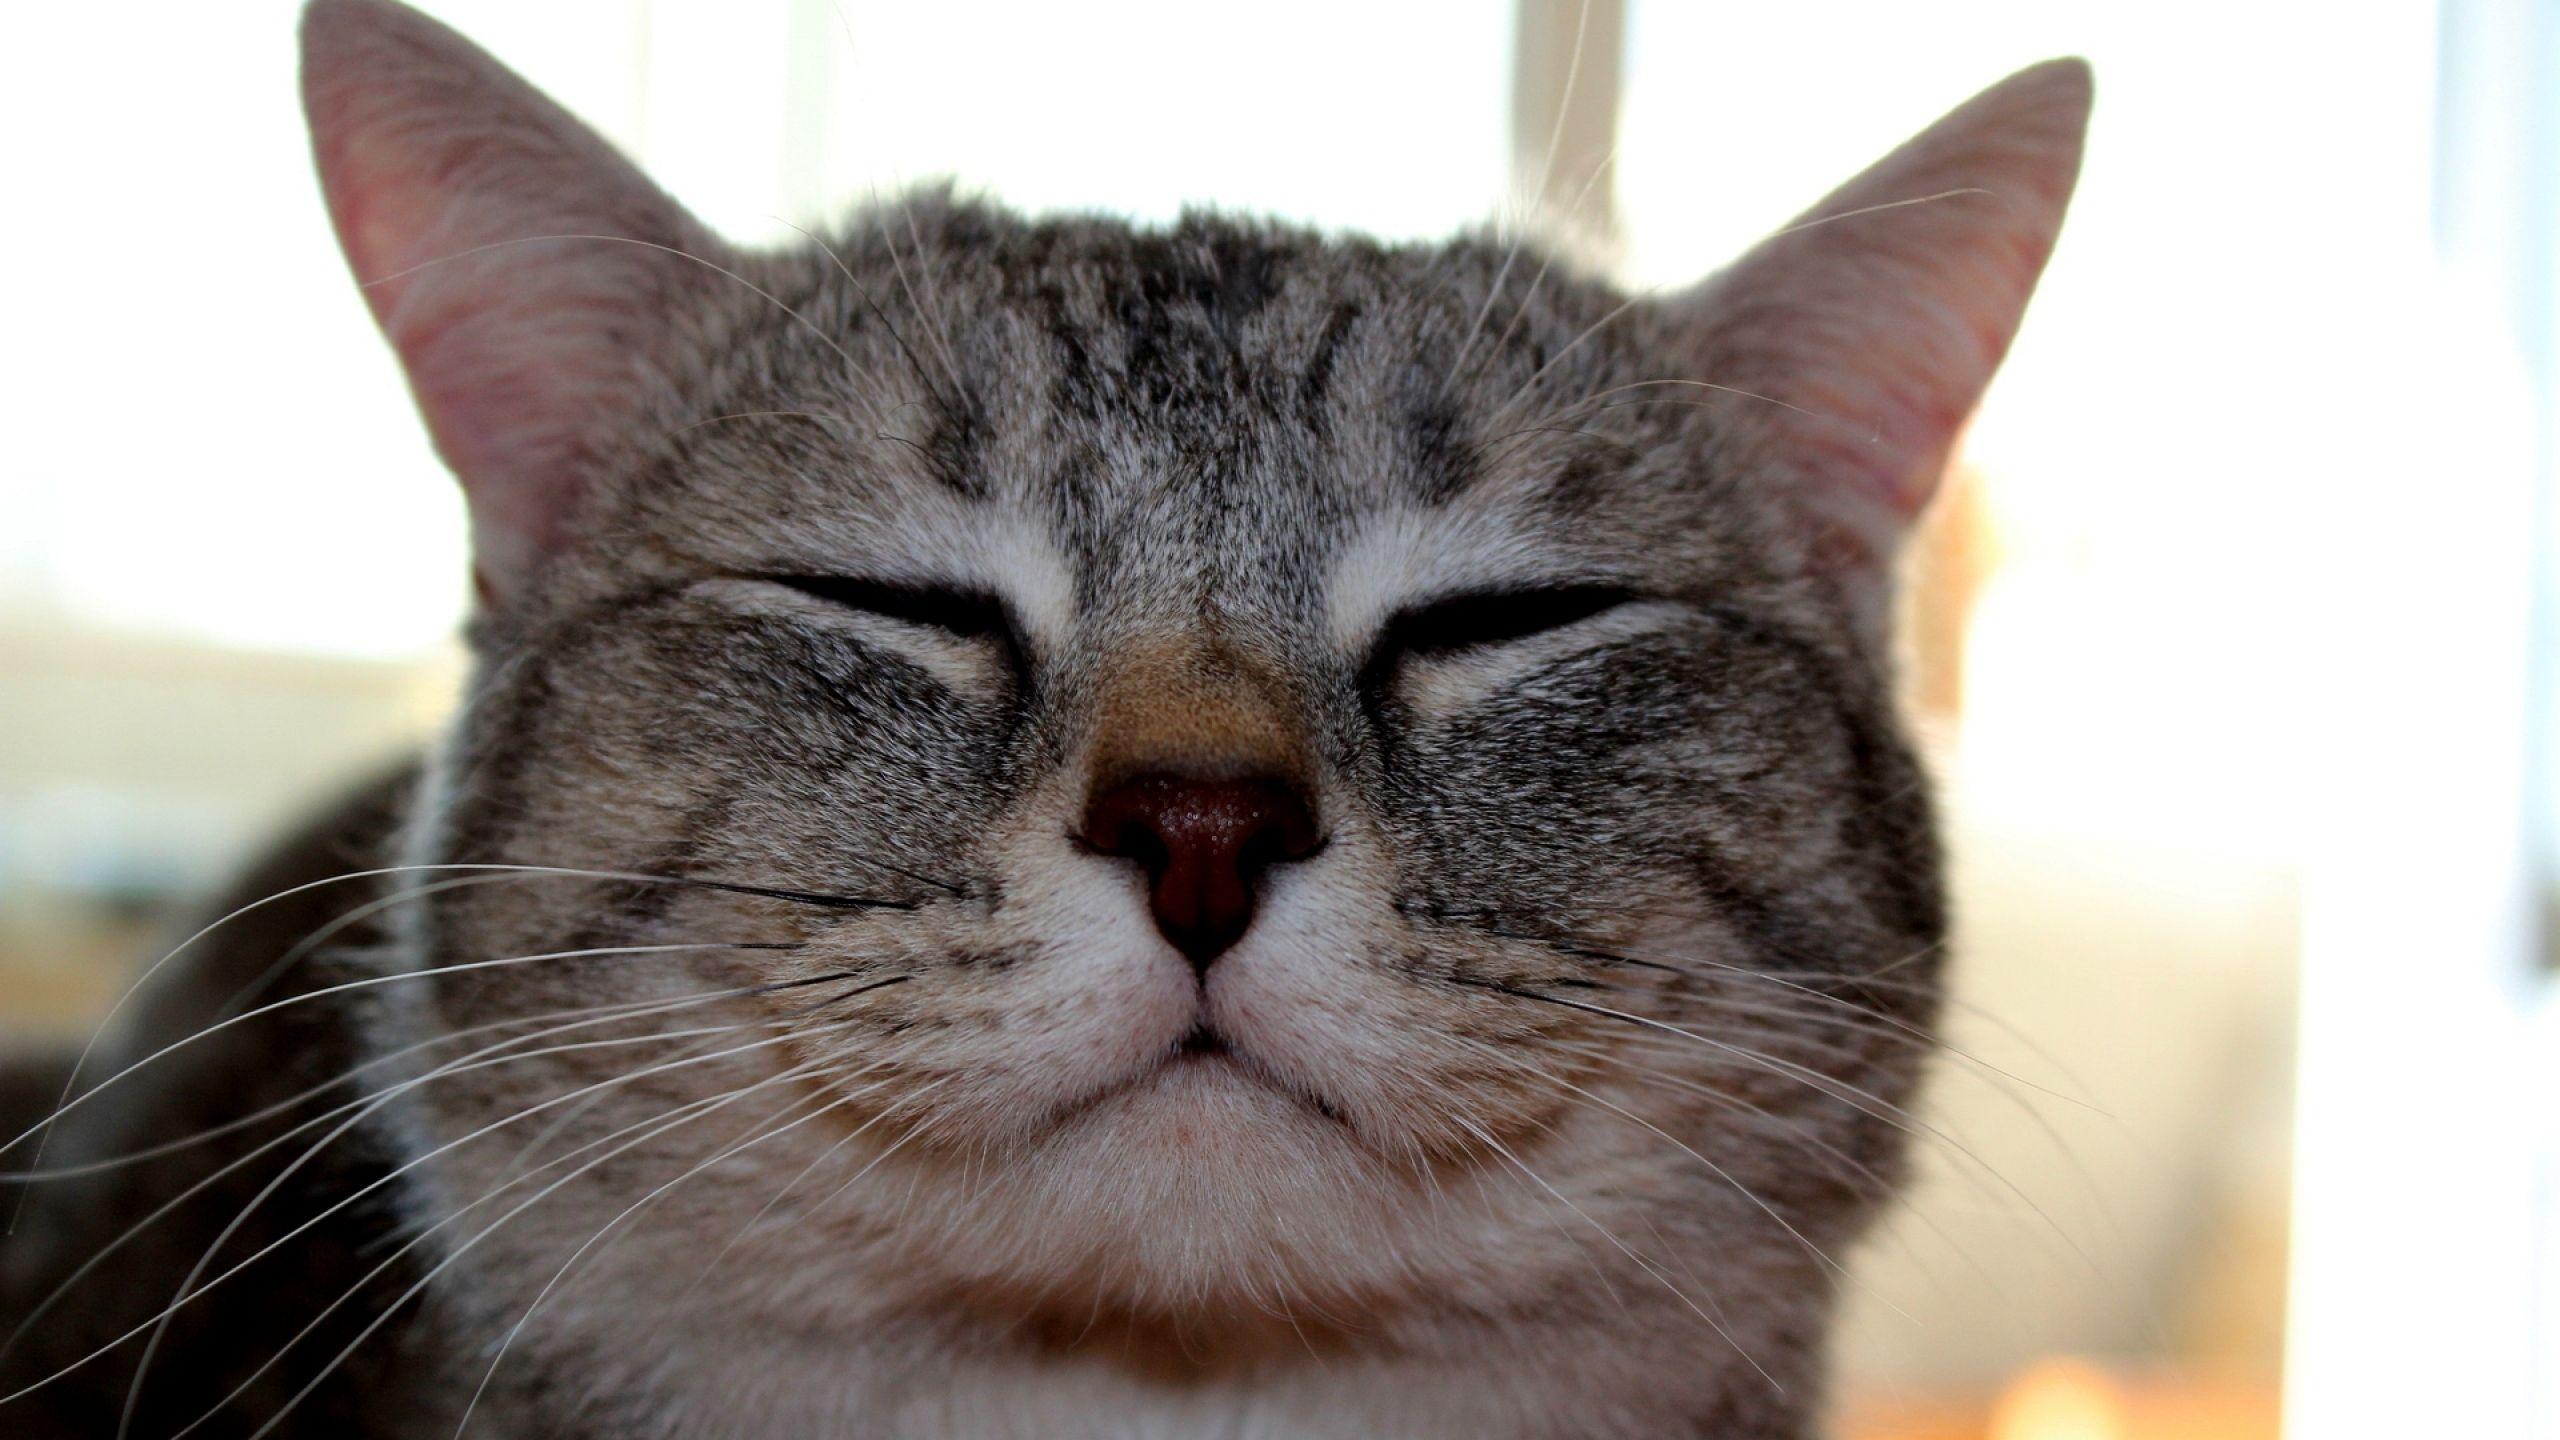 2560x1440 Wallpaper cat, face, happy Smiling cat, Funny